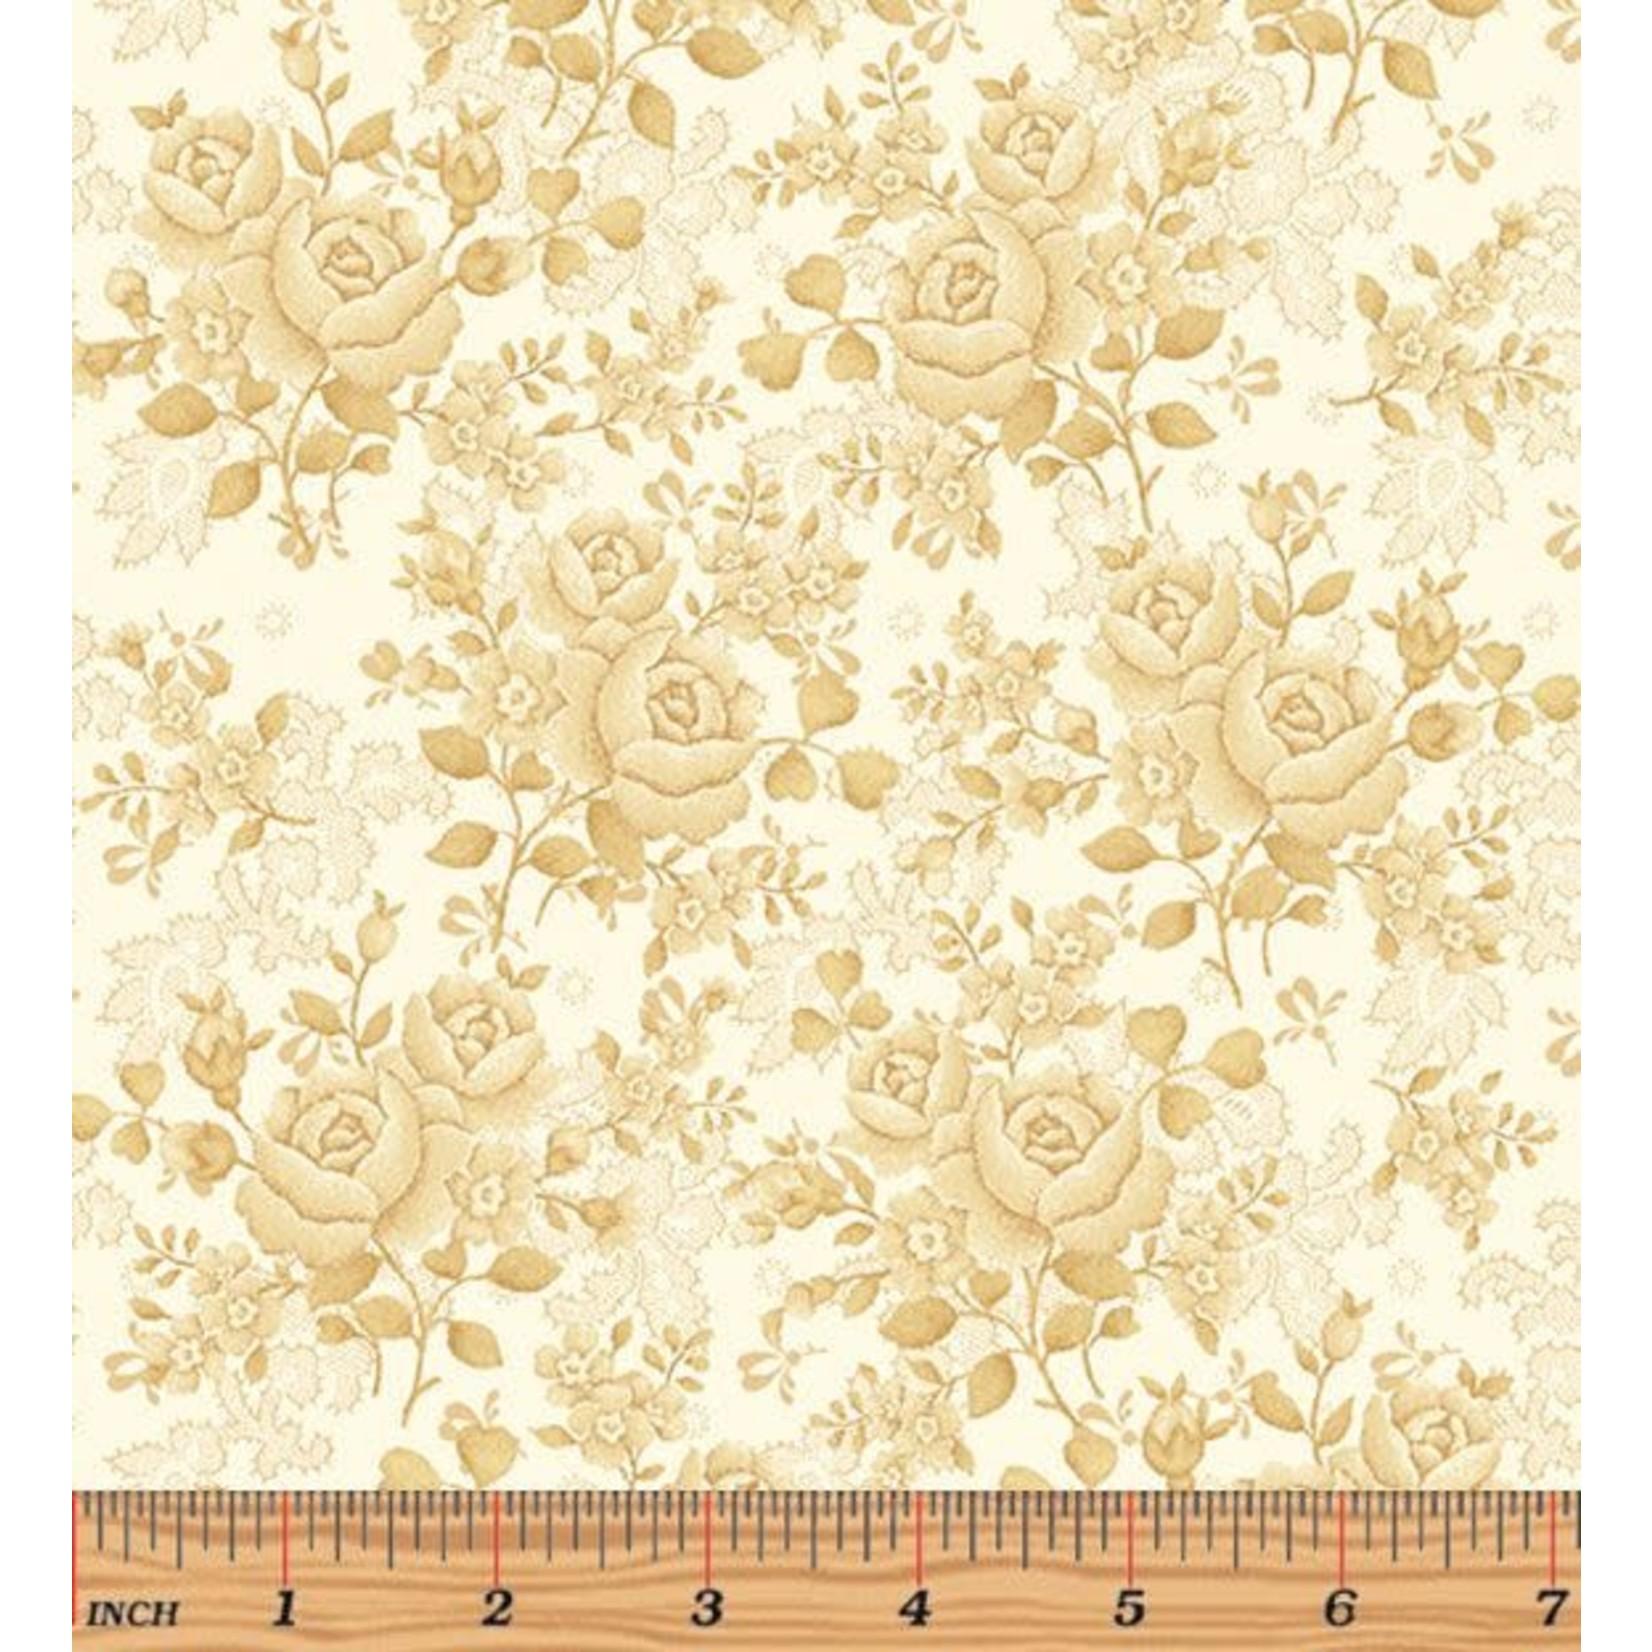 Benartex Studio Homestead Carriage - Climbing Rose - Cream - Coupon - 185 cm x 275 cm